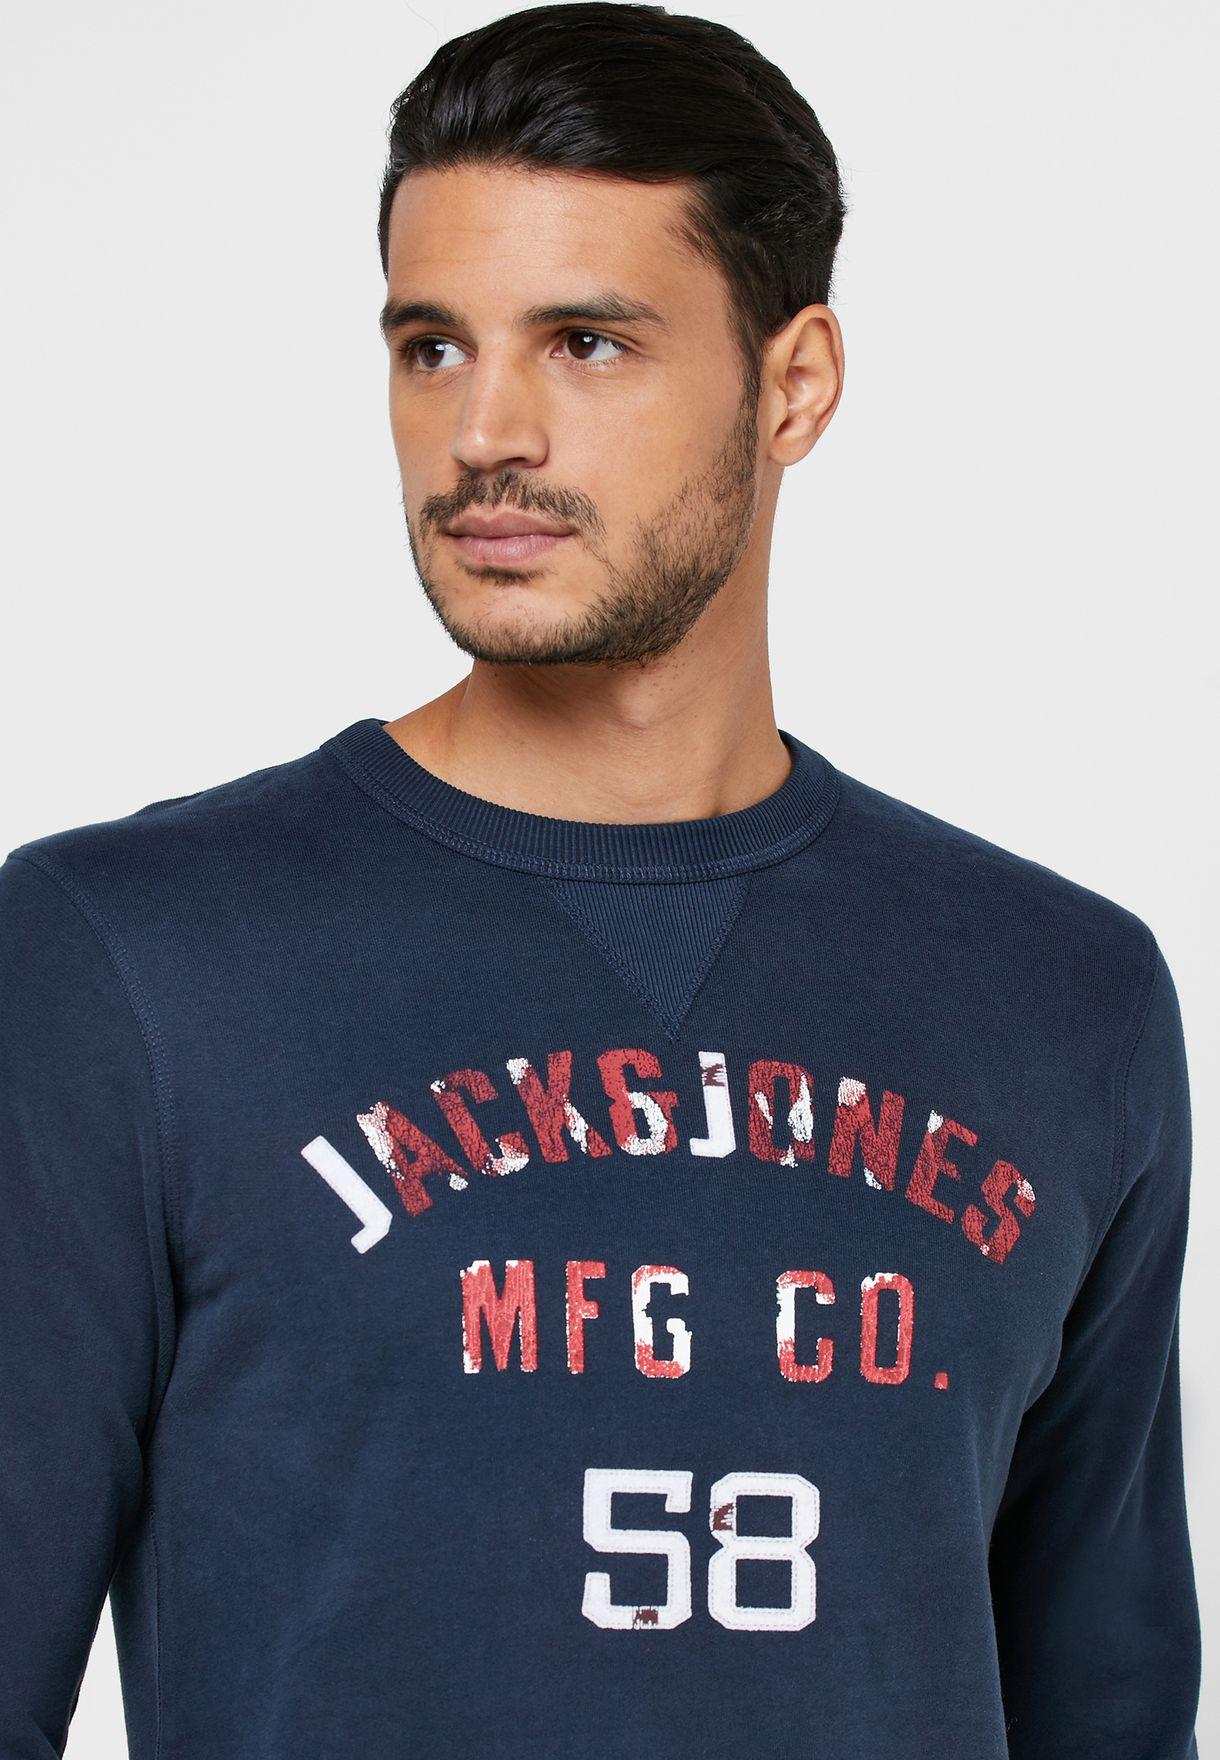 Owen Regular Fit Sweatshirt